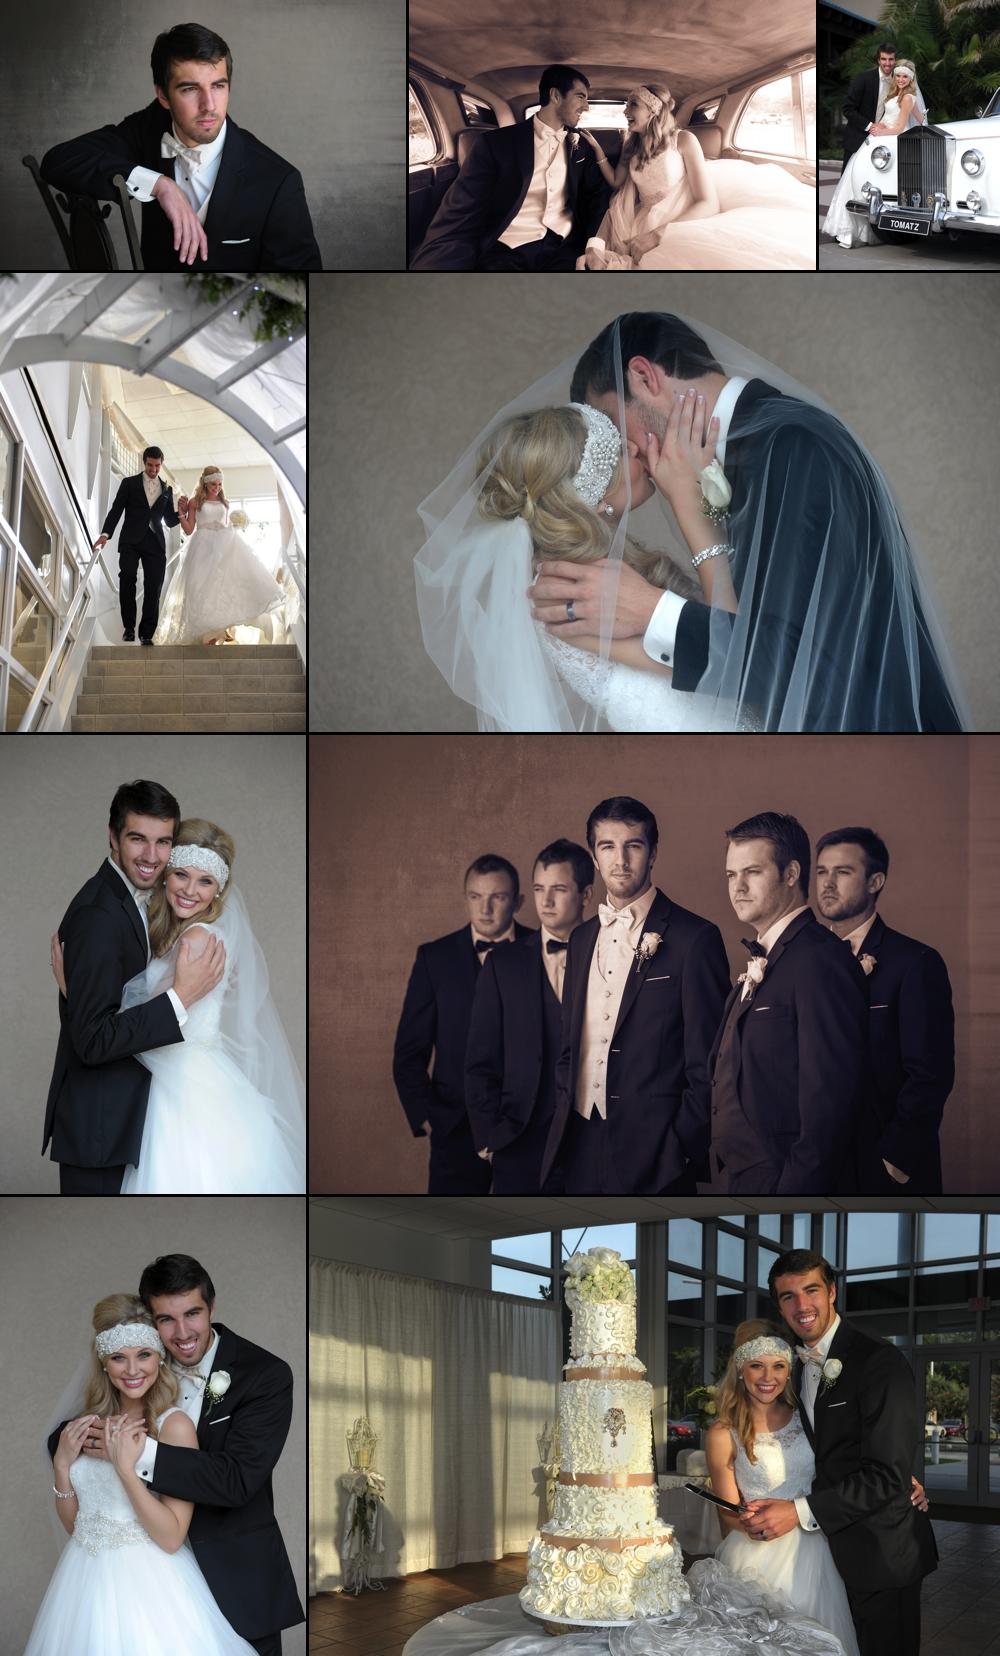 Houston Wedding Photographerweddings Archives Page 6 Of